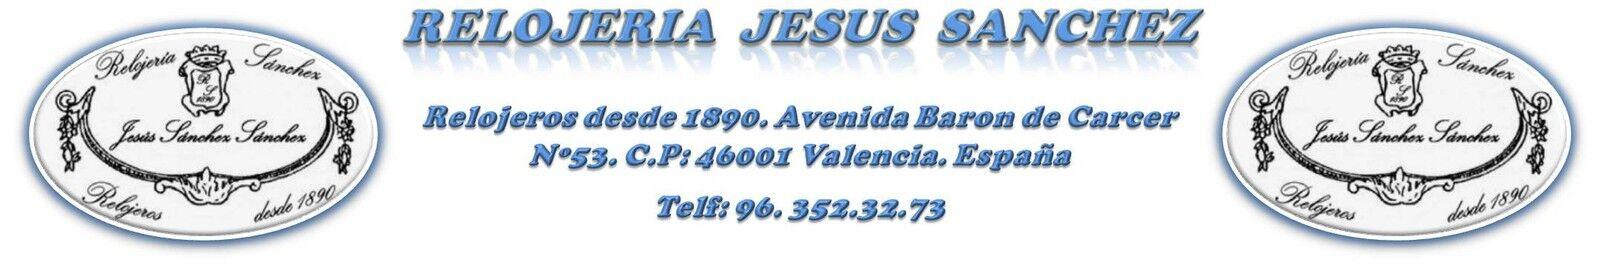 RELOJERIA JESUS SANCHEZ